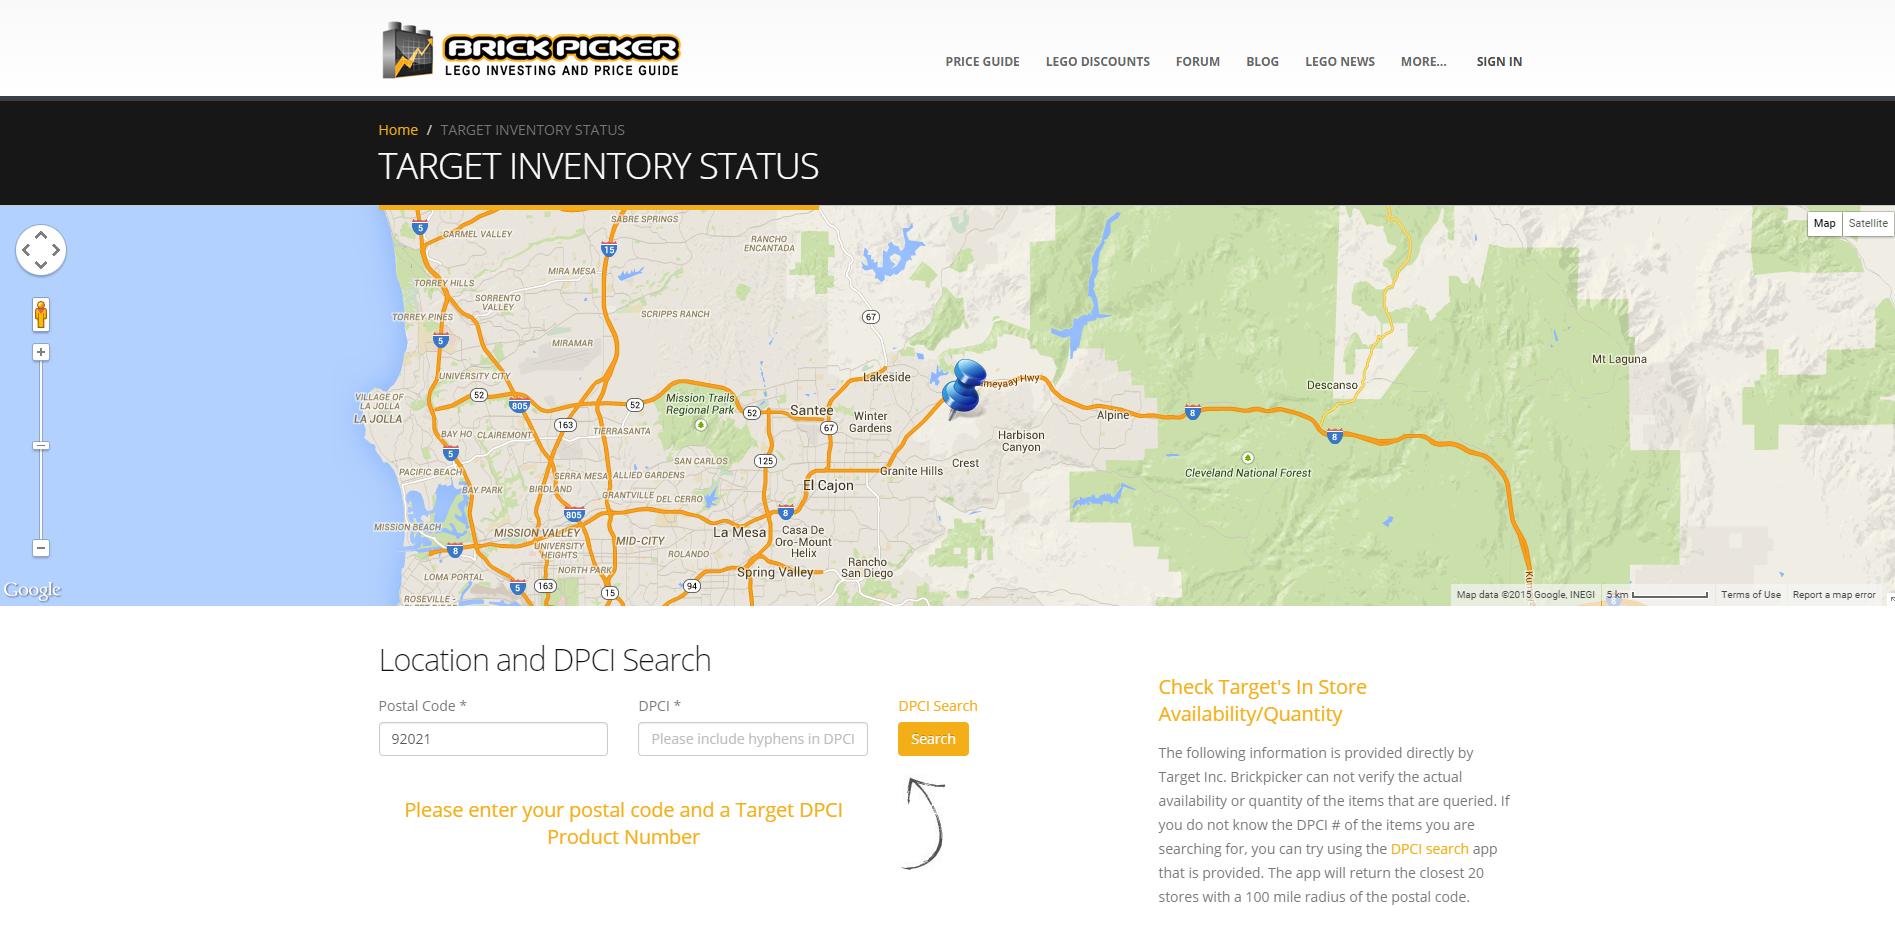 new target inventory tracker tool by brickpicker